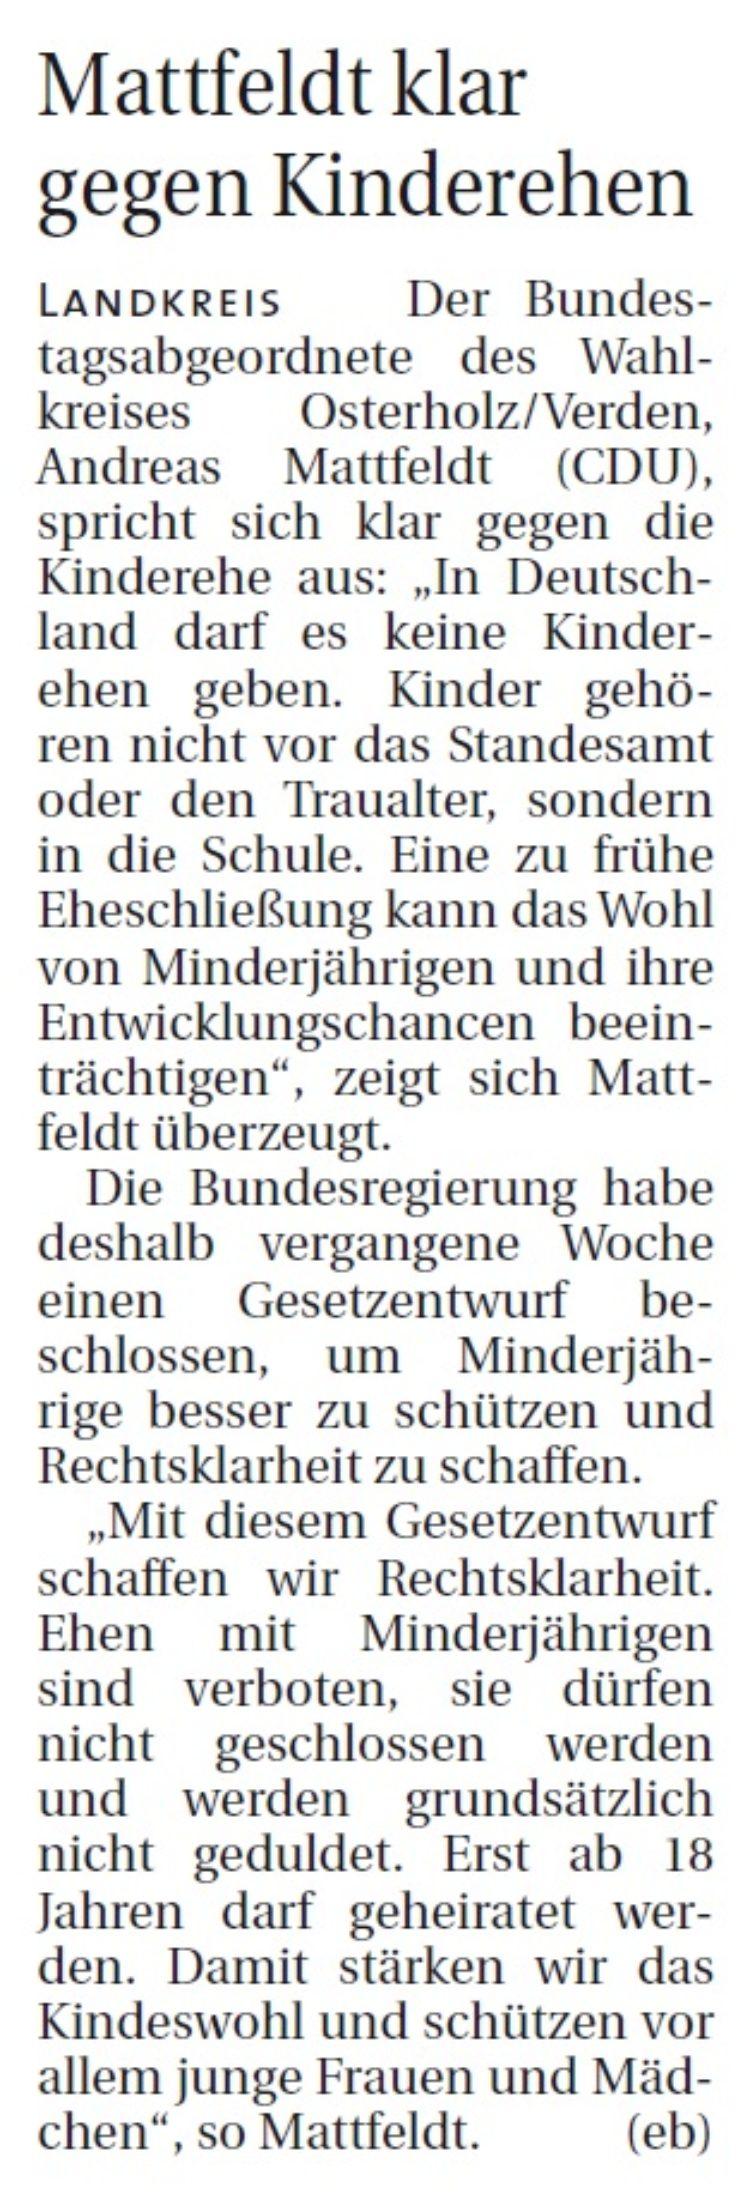 Mattfeldt klar gegen Kinderehen